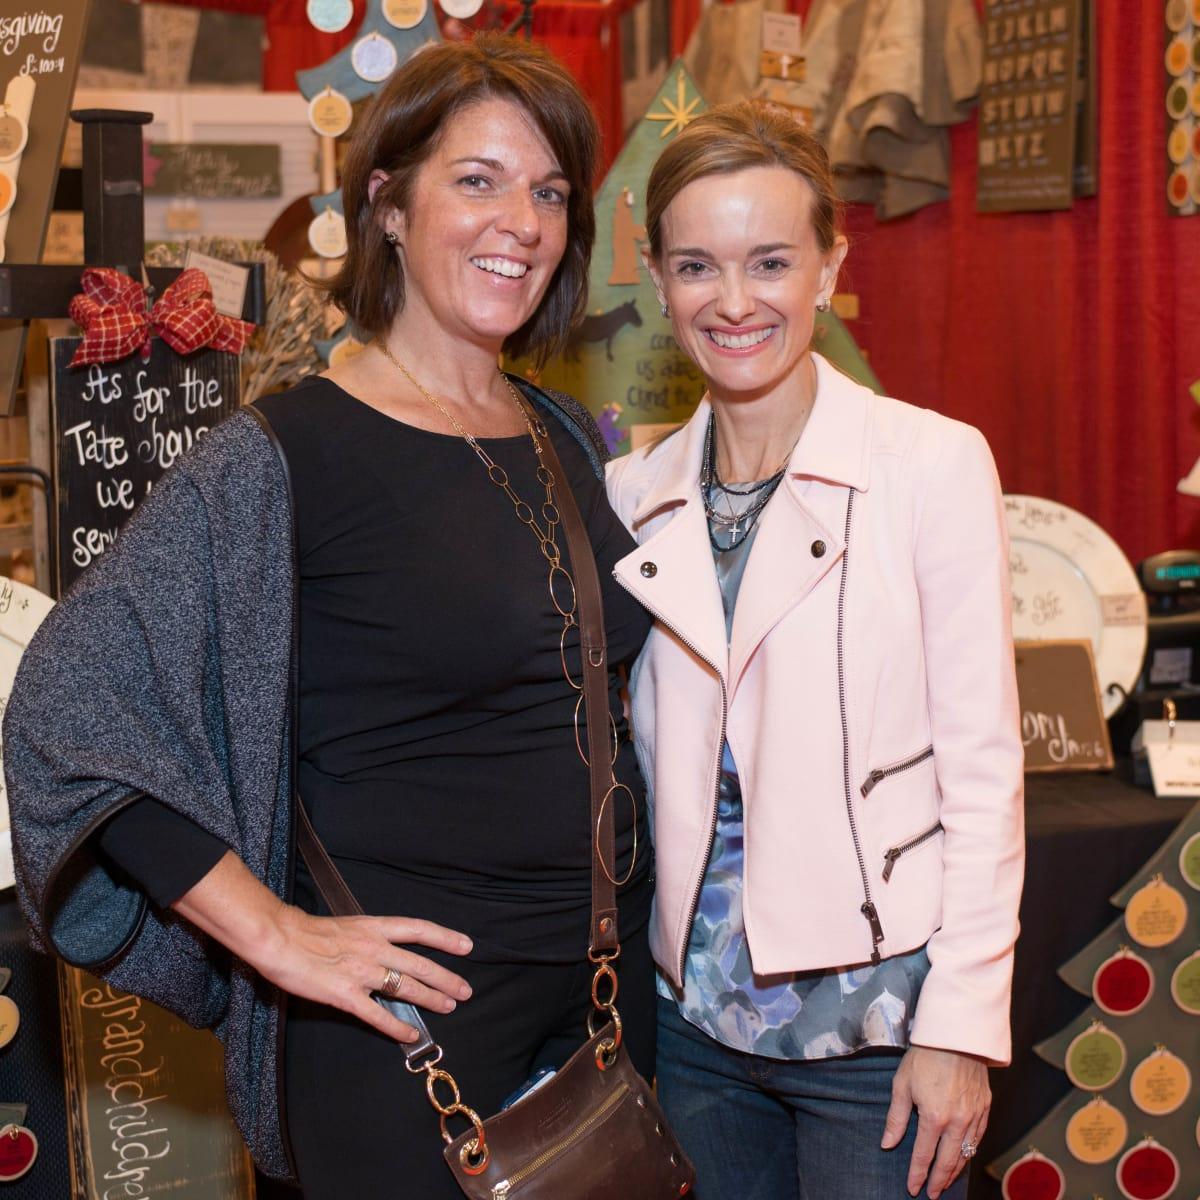 News, Shelby, Nutcracker Market, Nov. 2015, Karen Haysley, Corinne Vandermeer